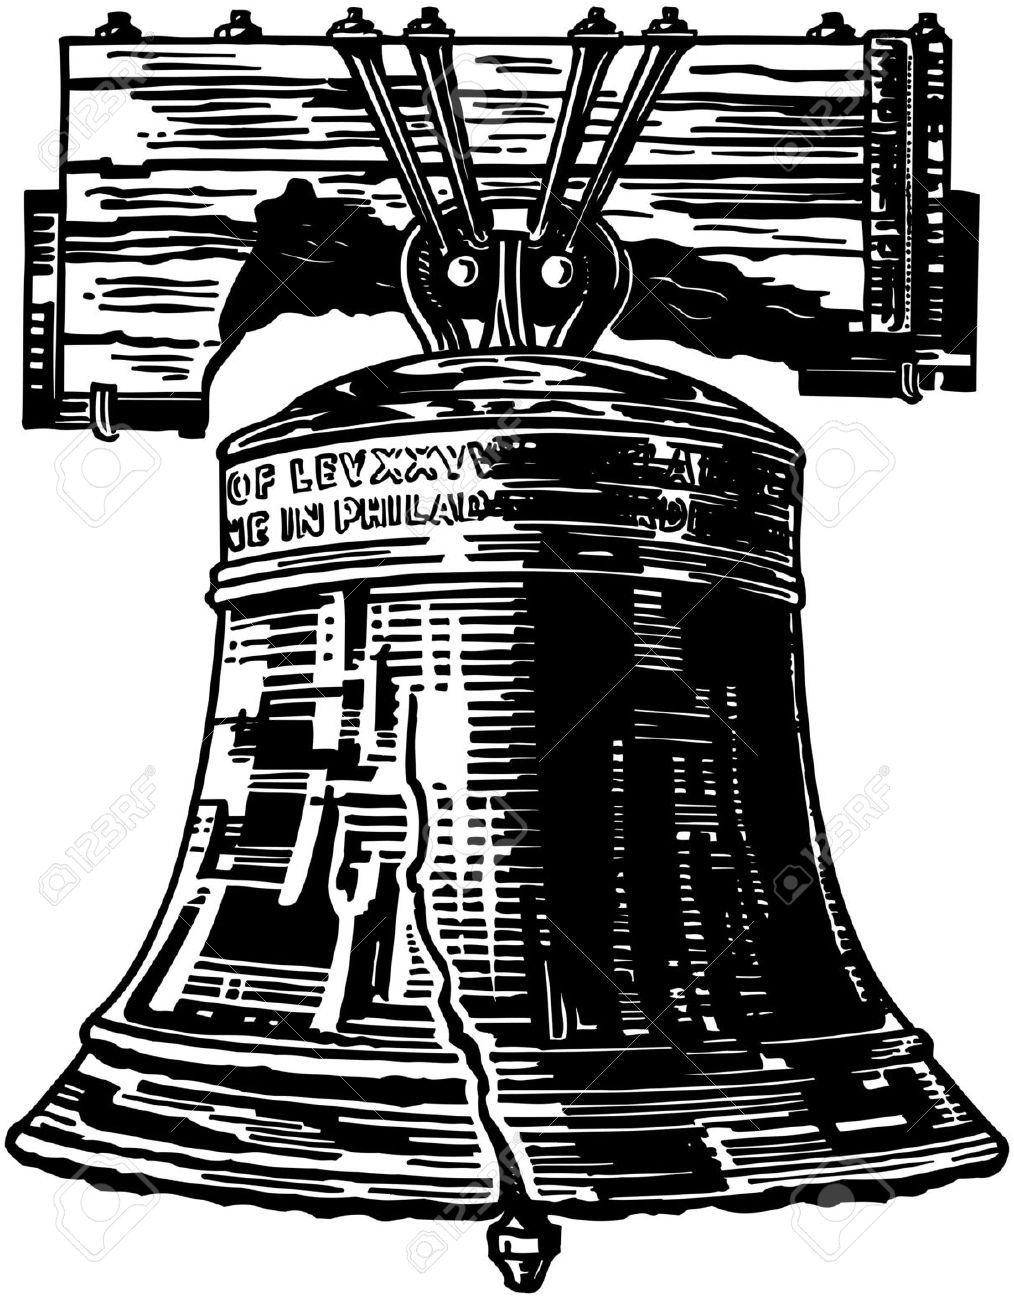 Bells clipart vector. Bell liberty philadelphia collection